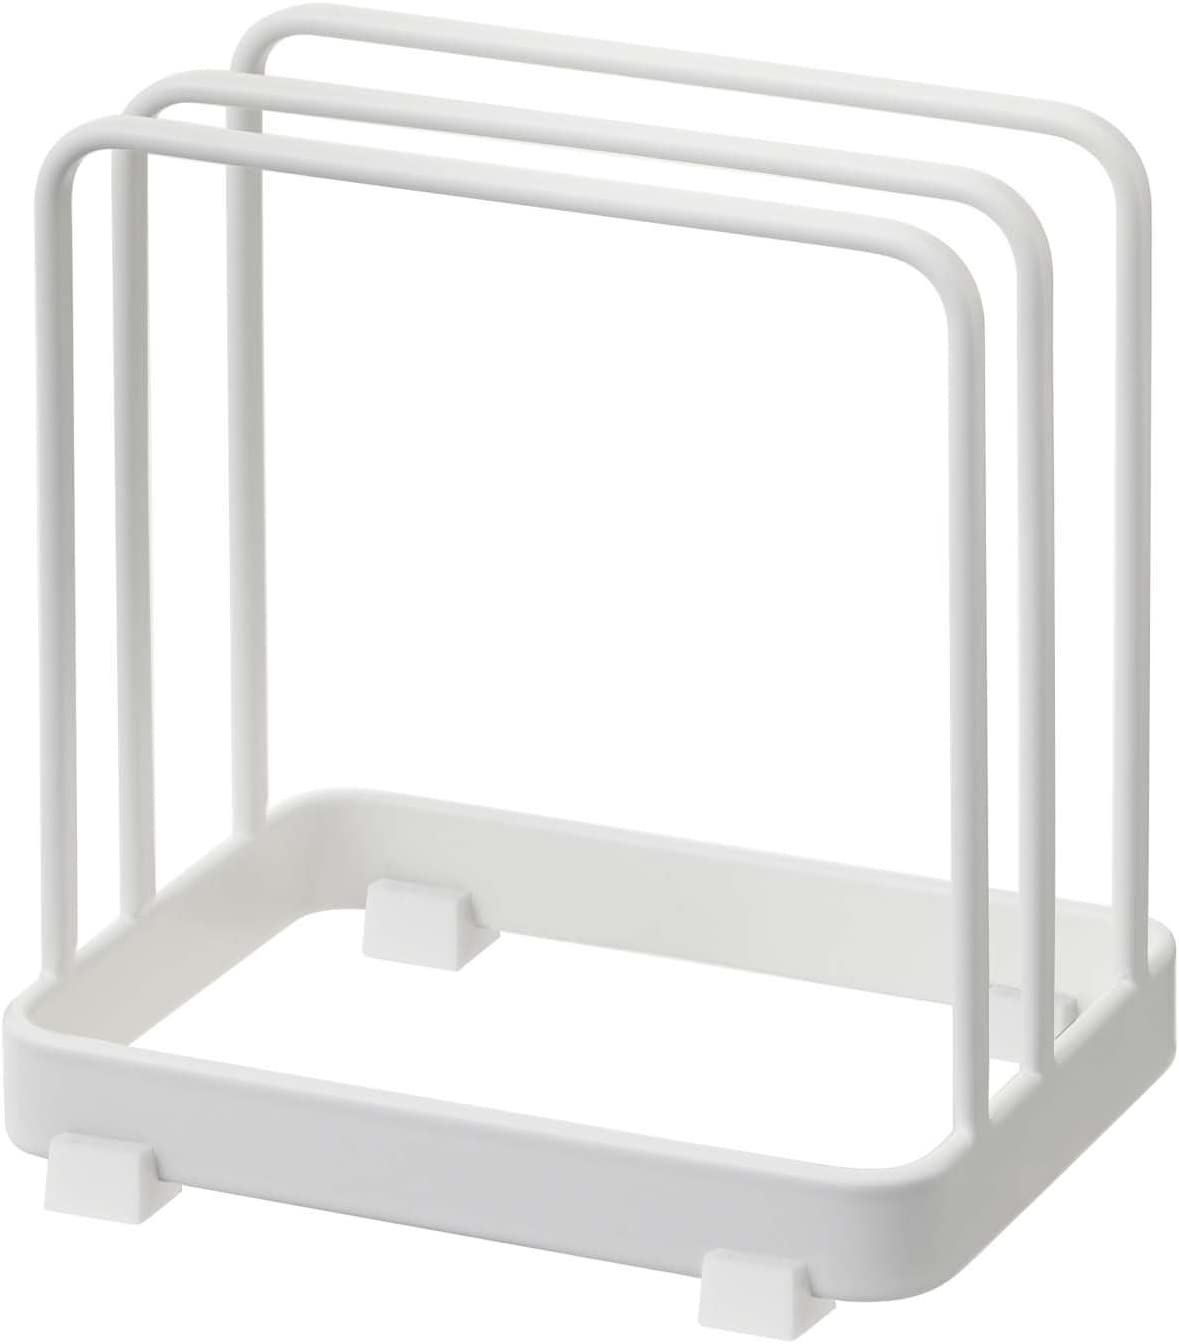 Yamazaki Home Plate Cutting Board Stand – Kitchen Storage Rack Holder Organizer